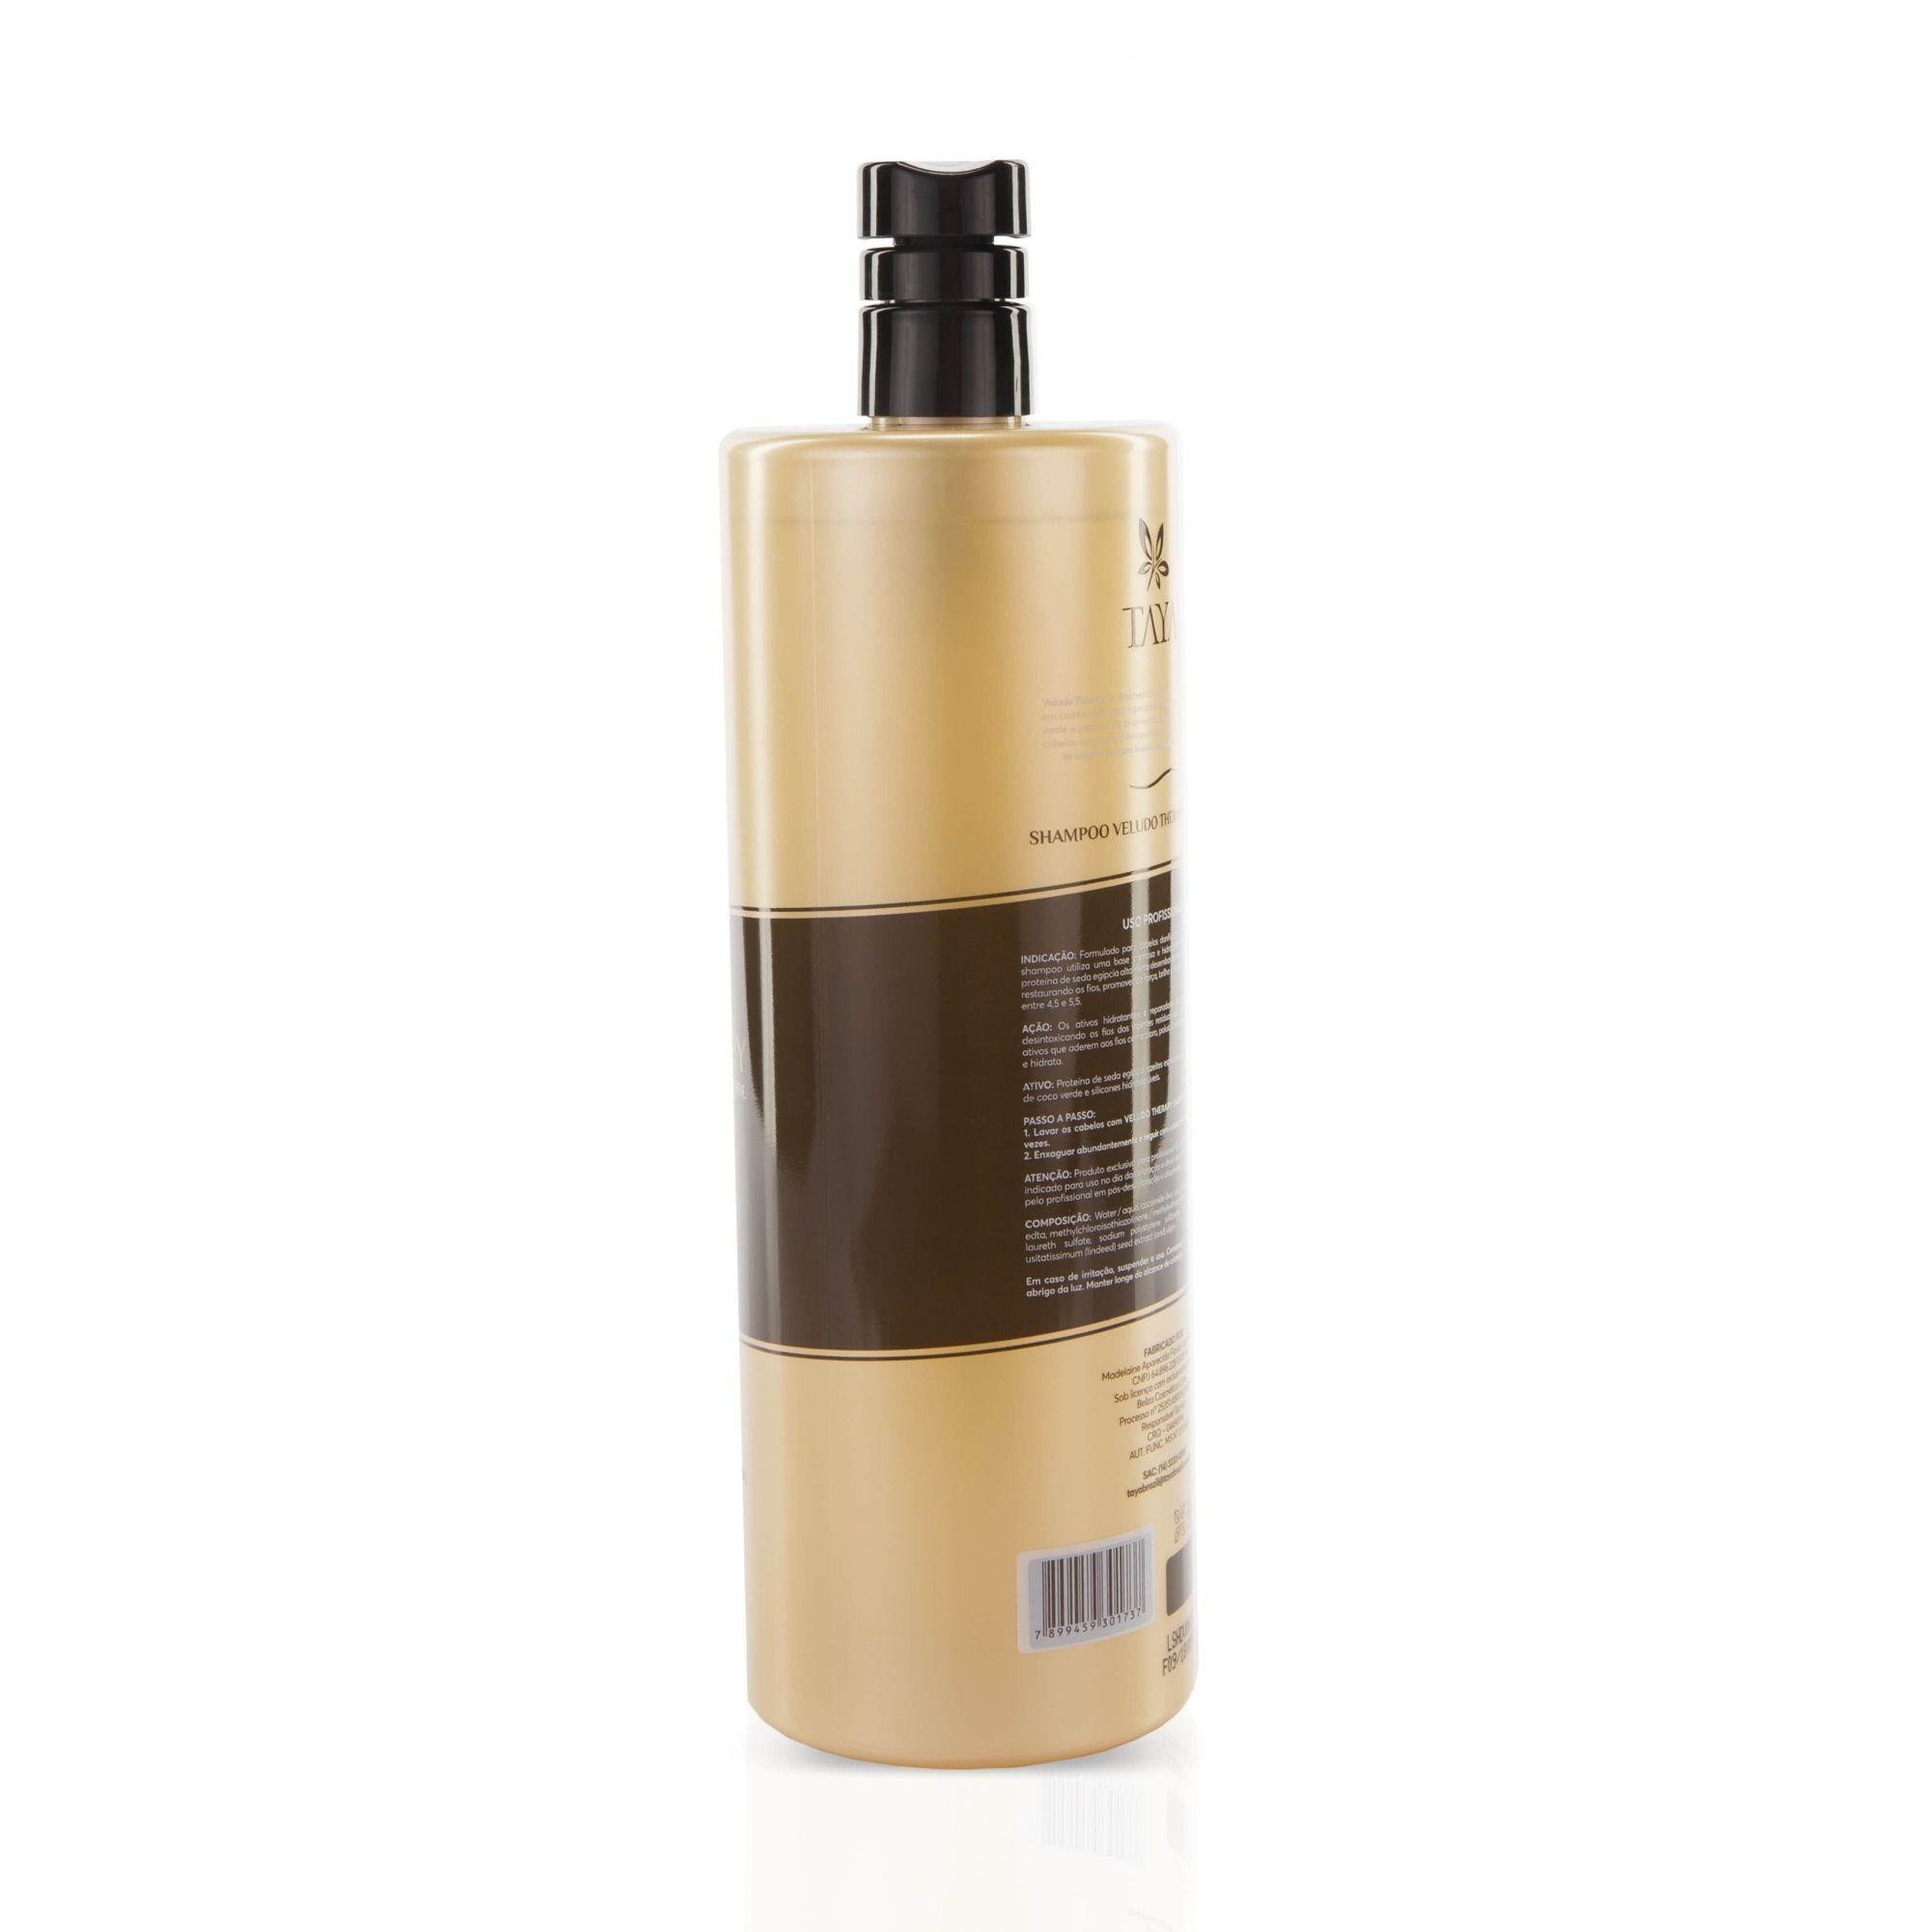 Shampoo Veludo Therapy Professional 1000ml